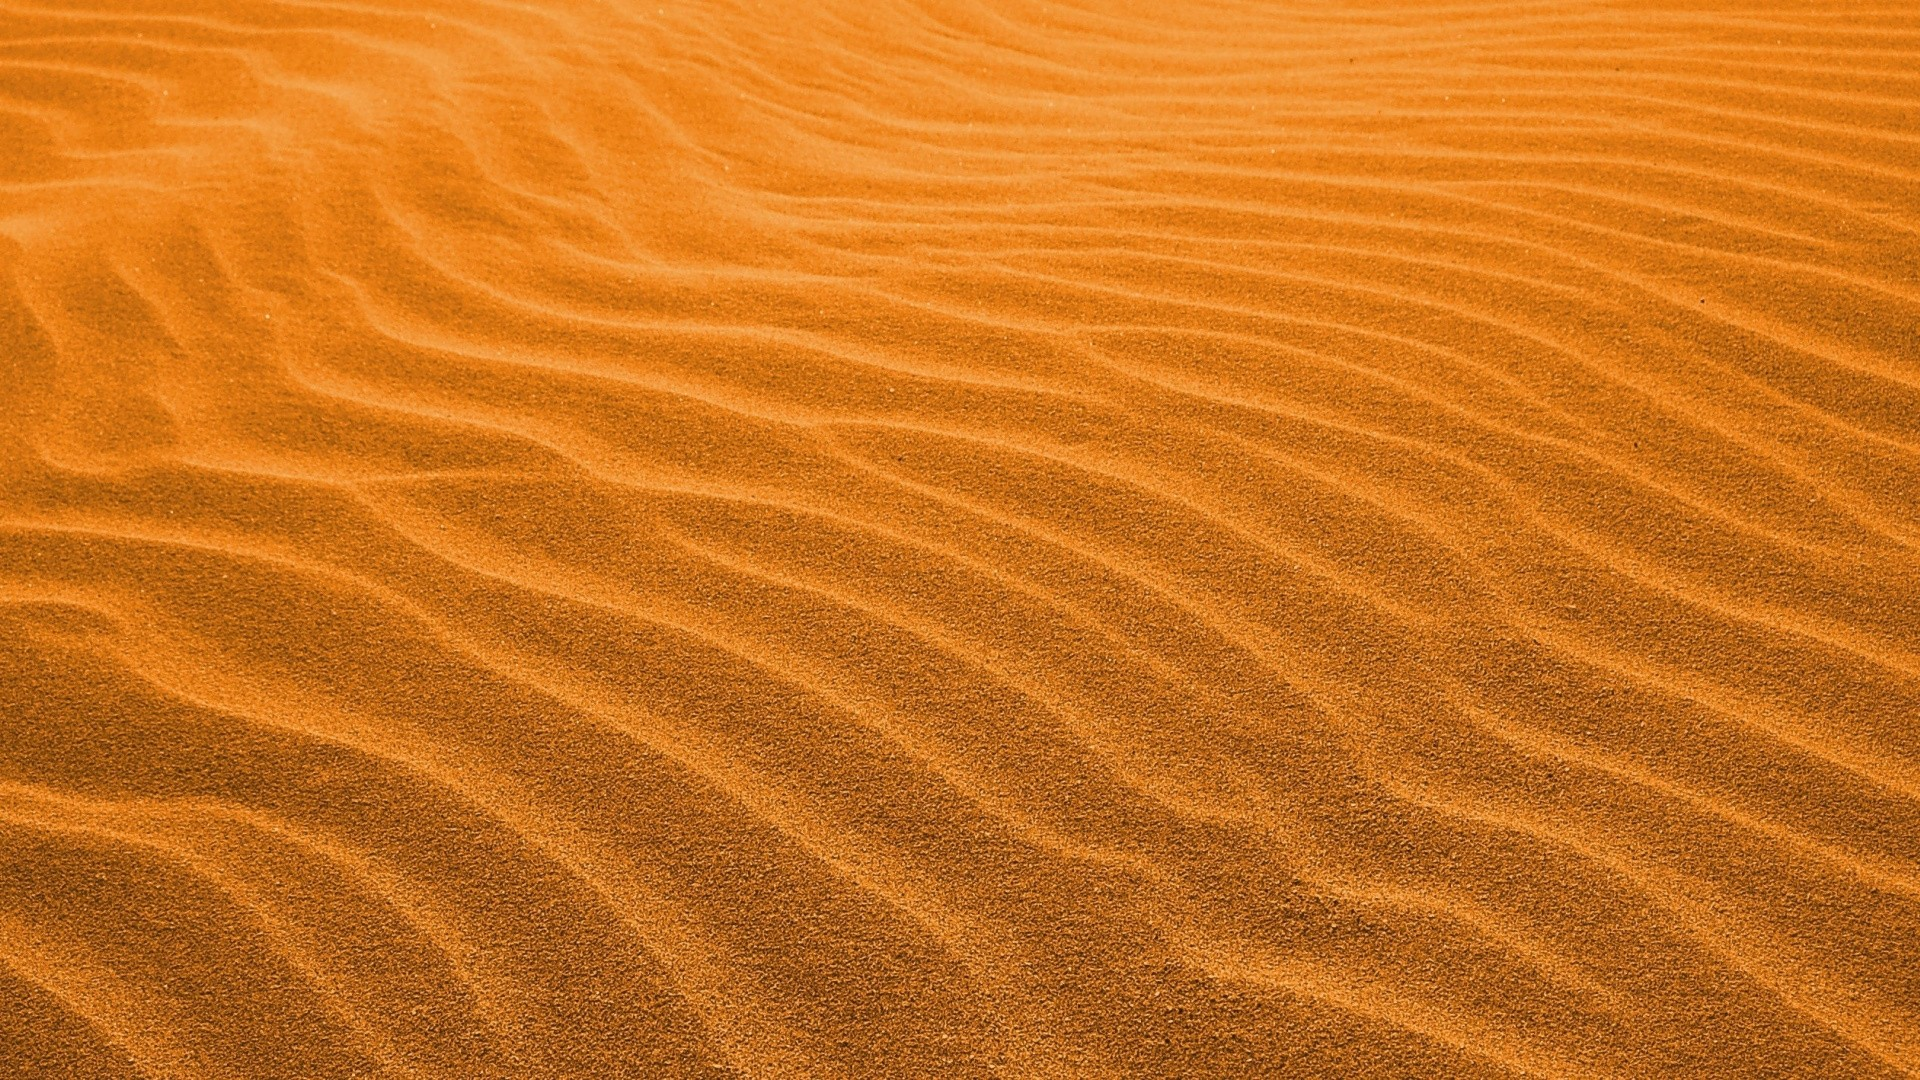 Sand 1920x1080 wallpaper